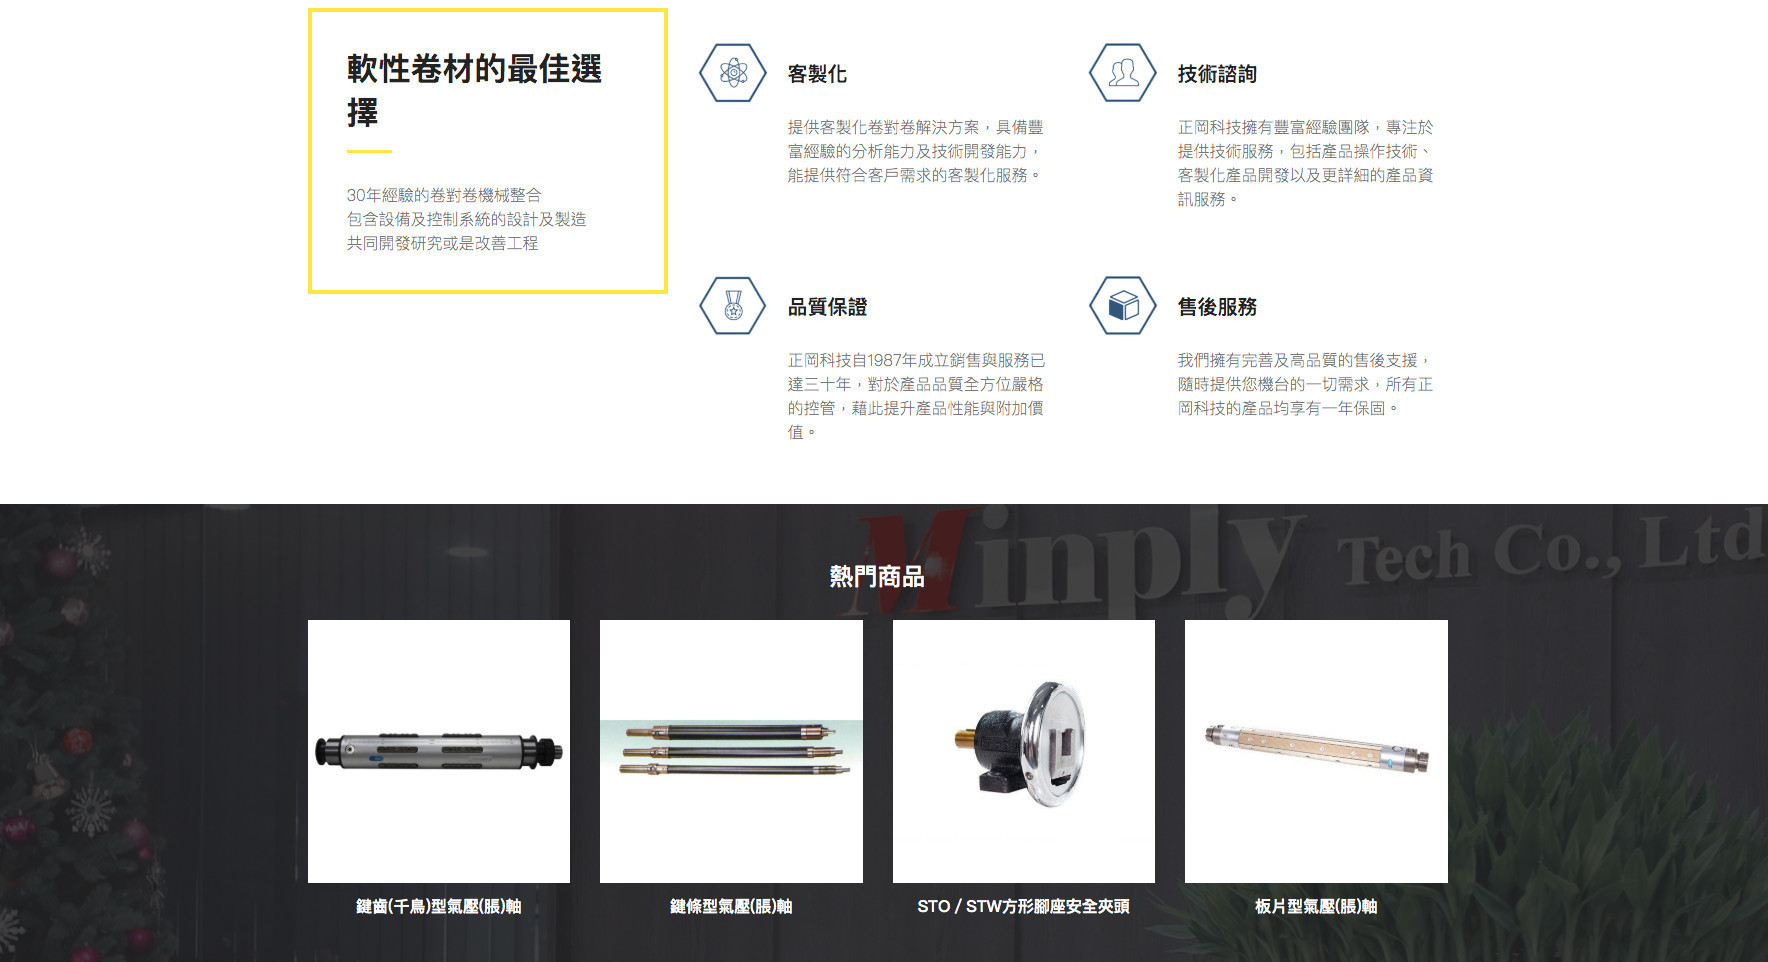 SEO網頁設計成功案例-正岡科技股份有限公司品牌介紹及熱銷產品